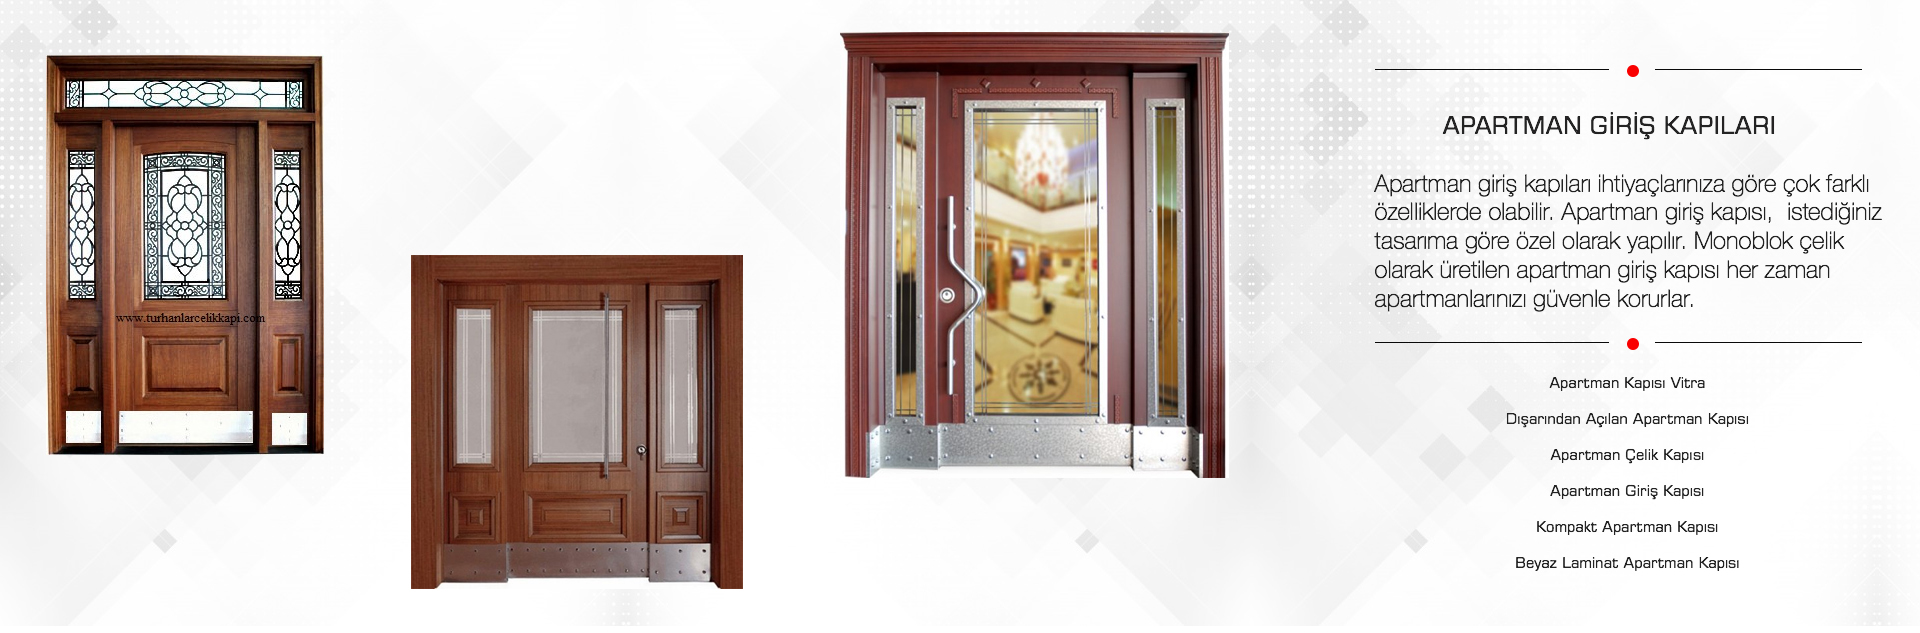 turhanlar apartman kapısı slider